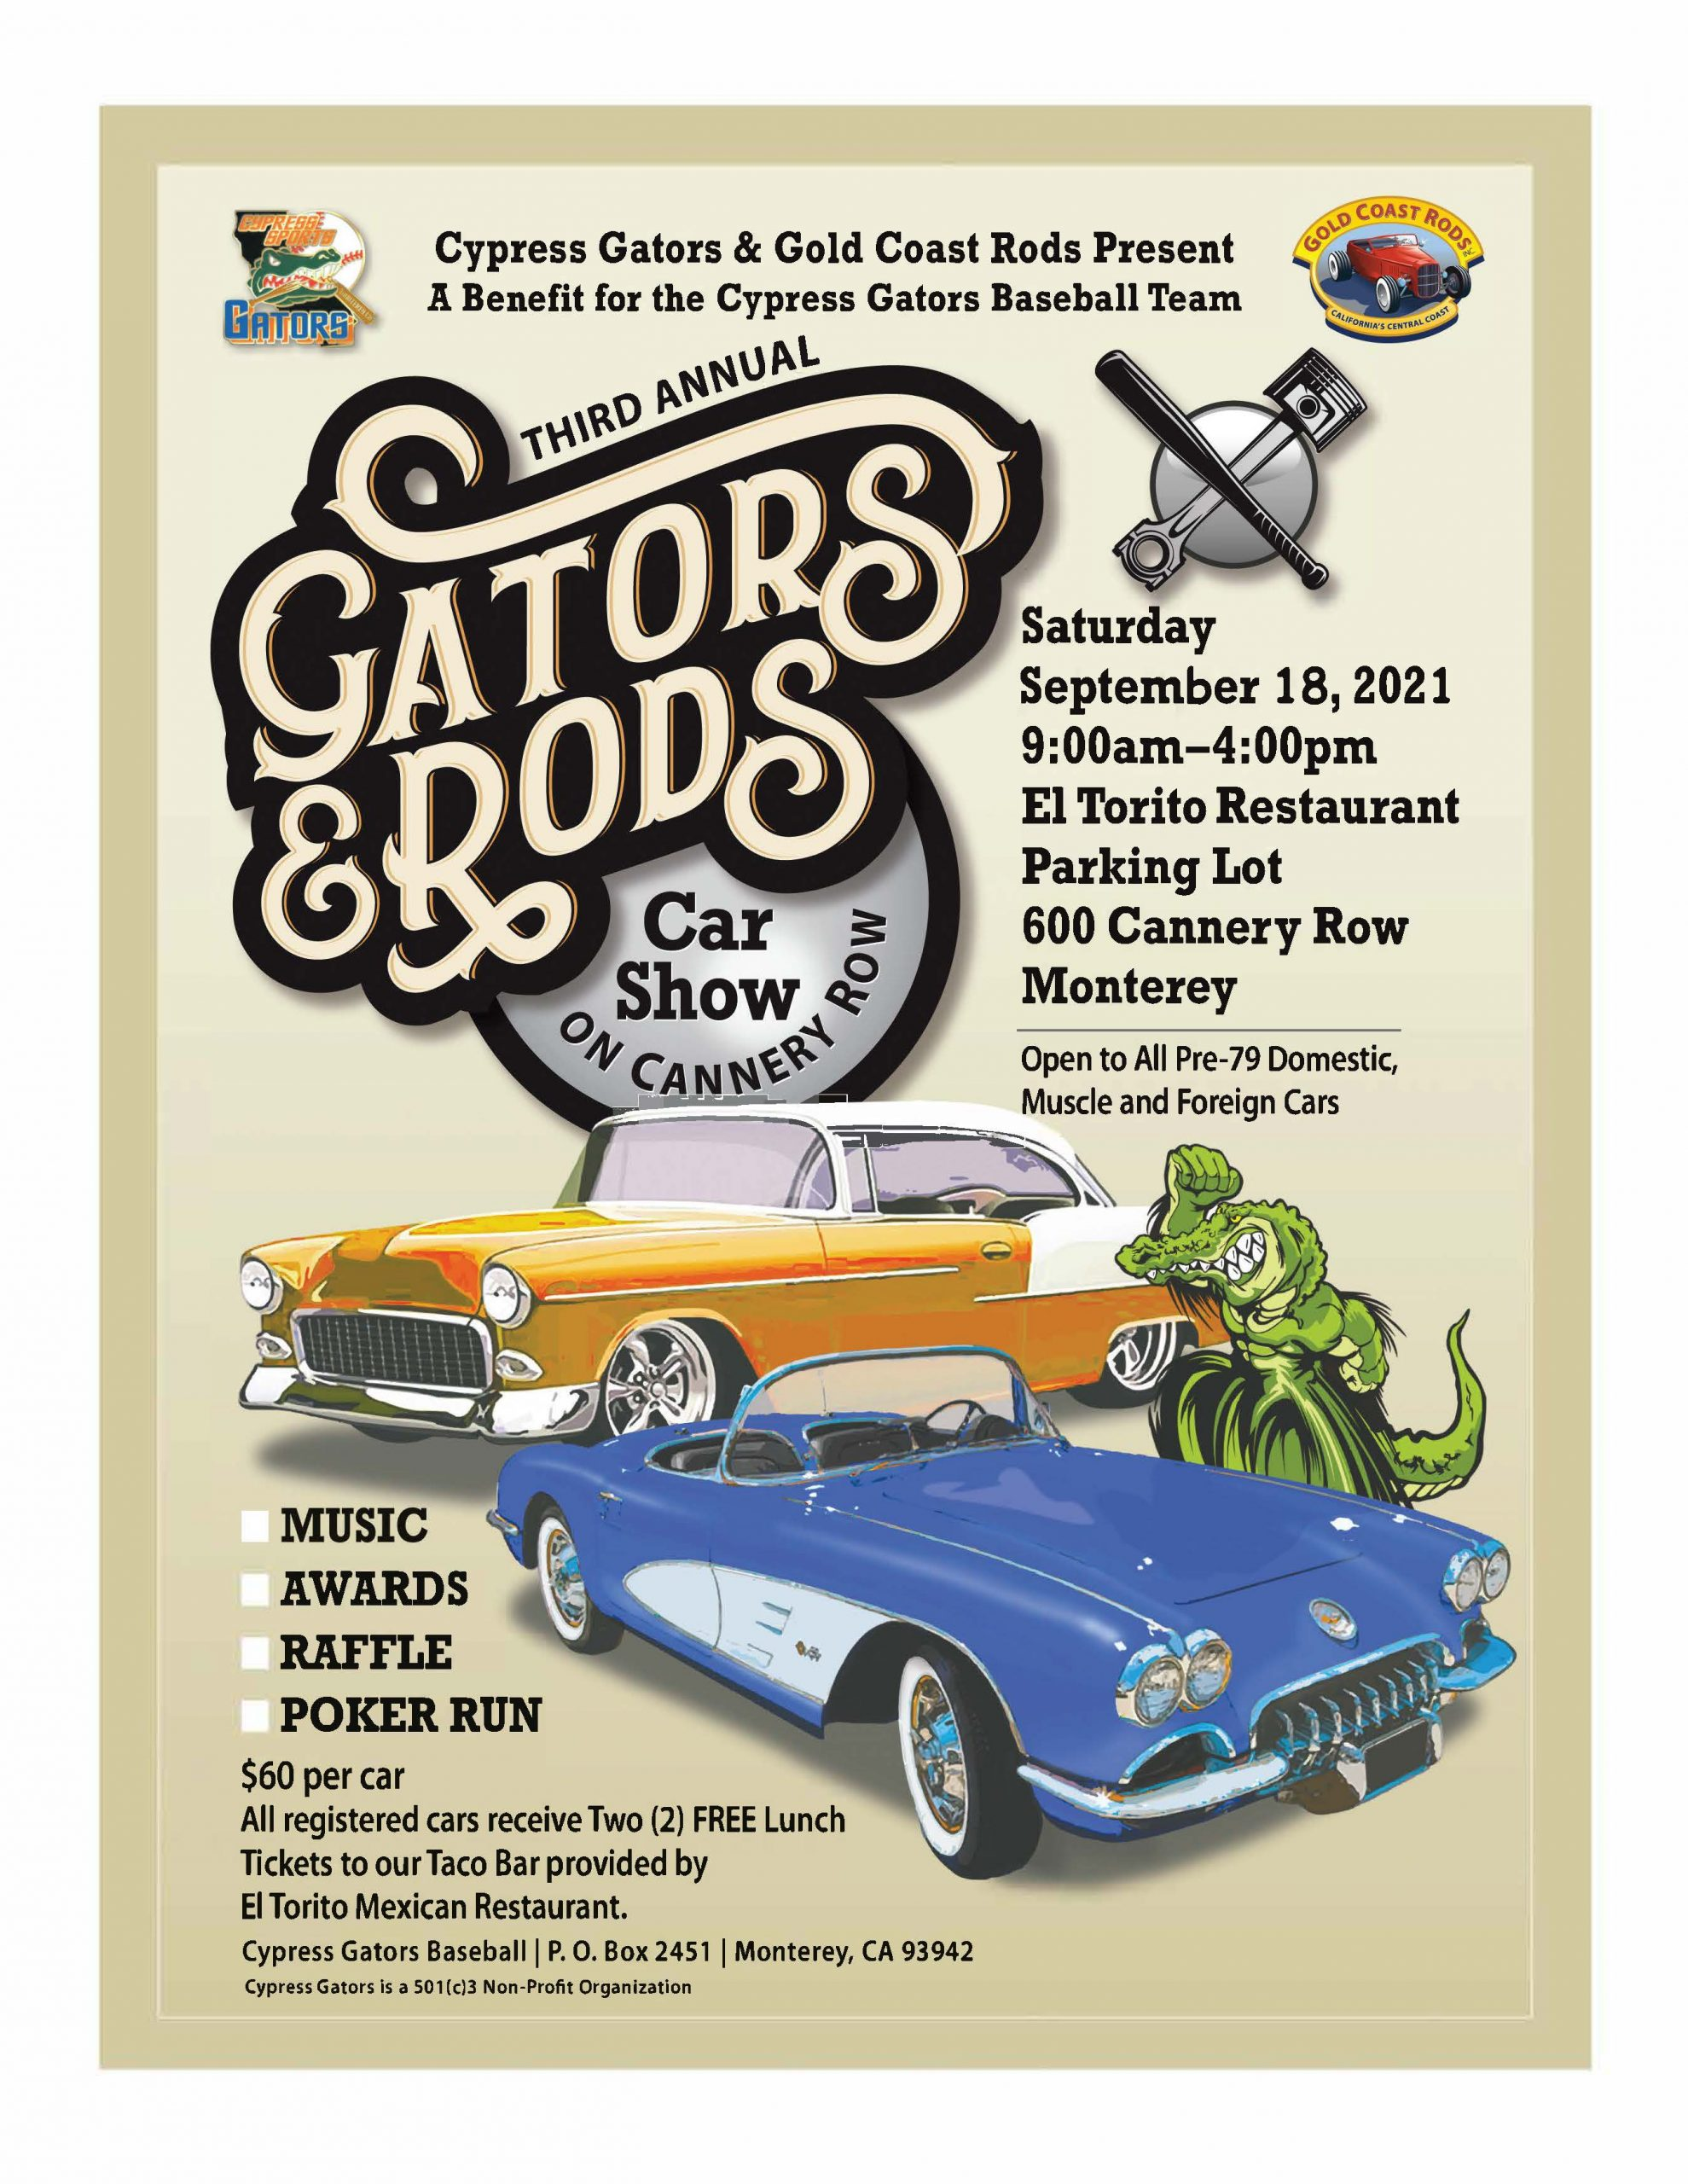 Gators & Rods Car Show